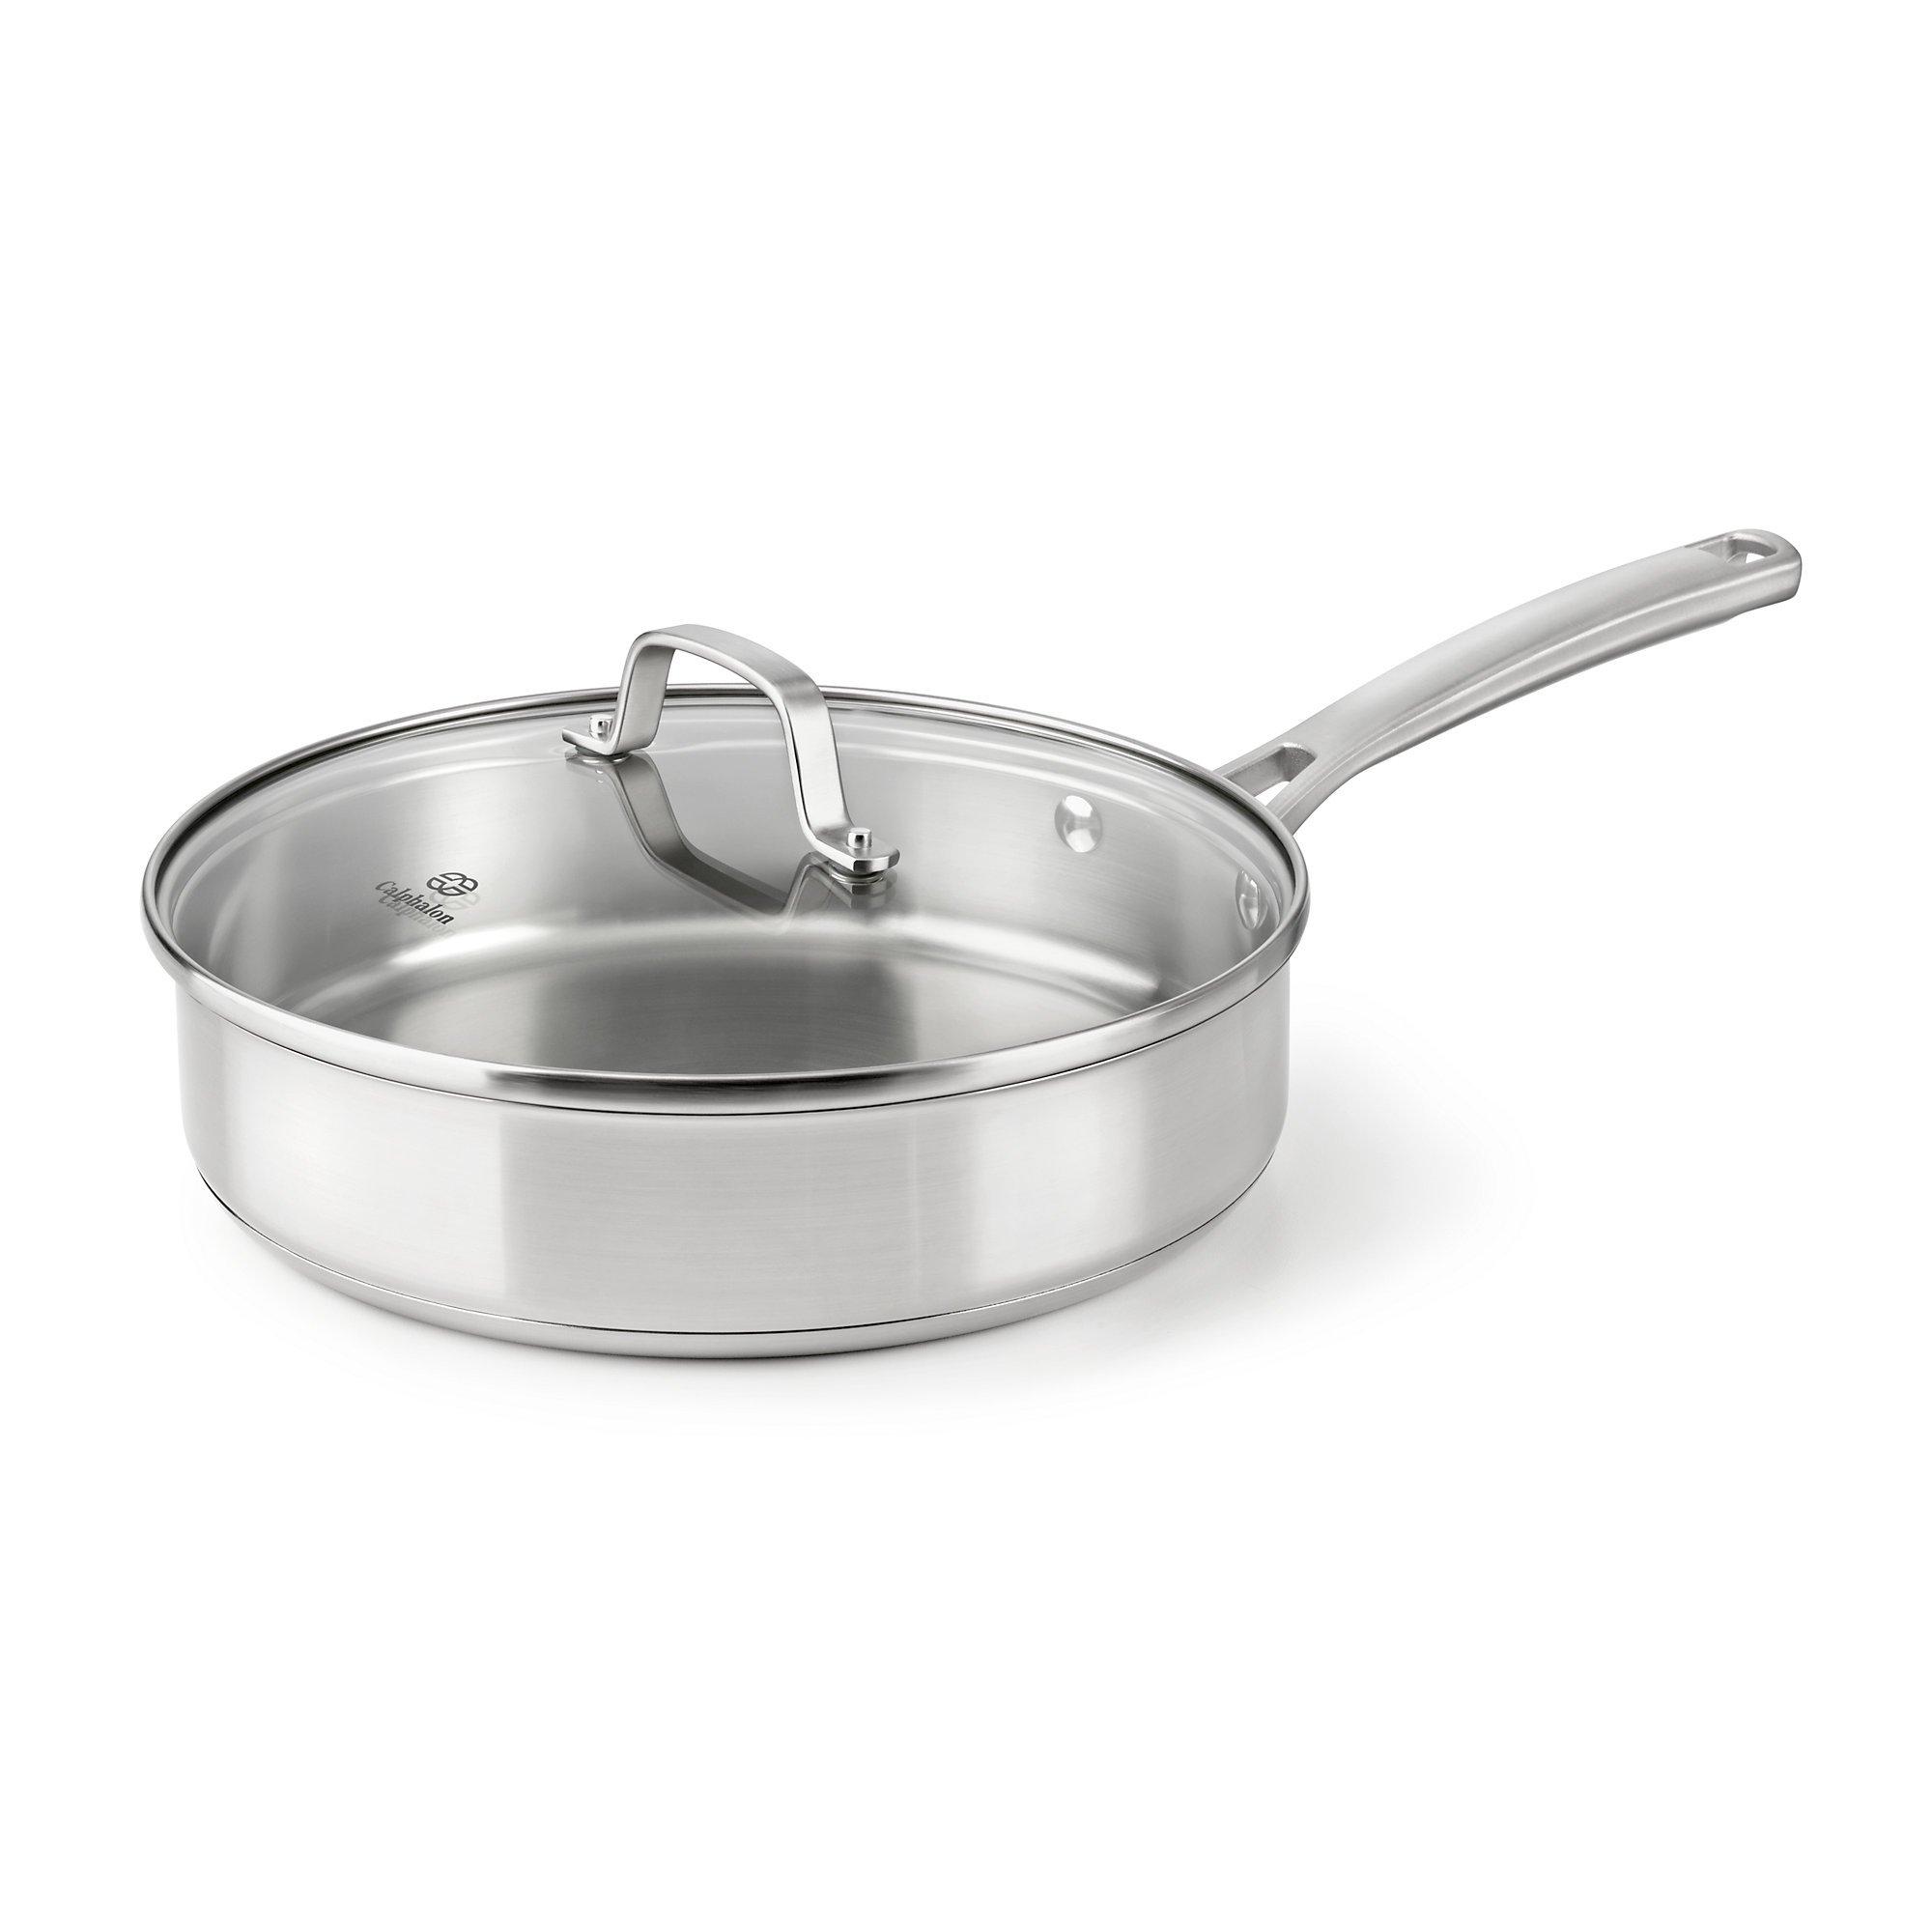 Calphalon Classic Stainless Steel Cookware, Saute Pan, 3-quart by Calphalon